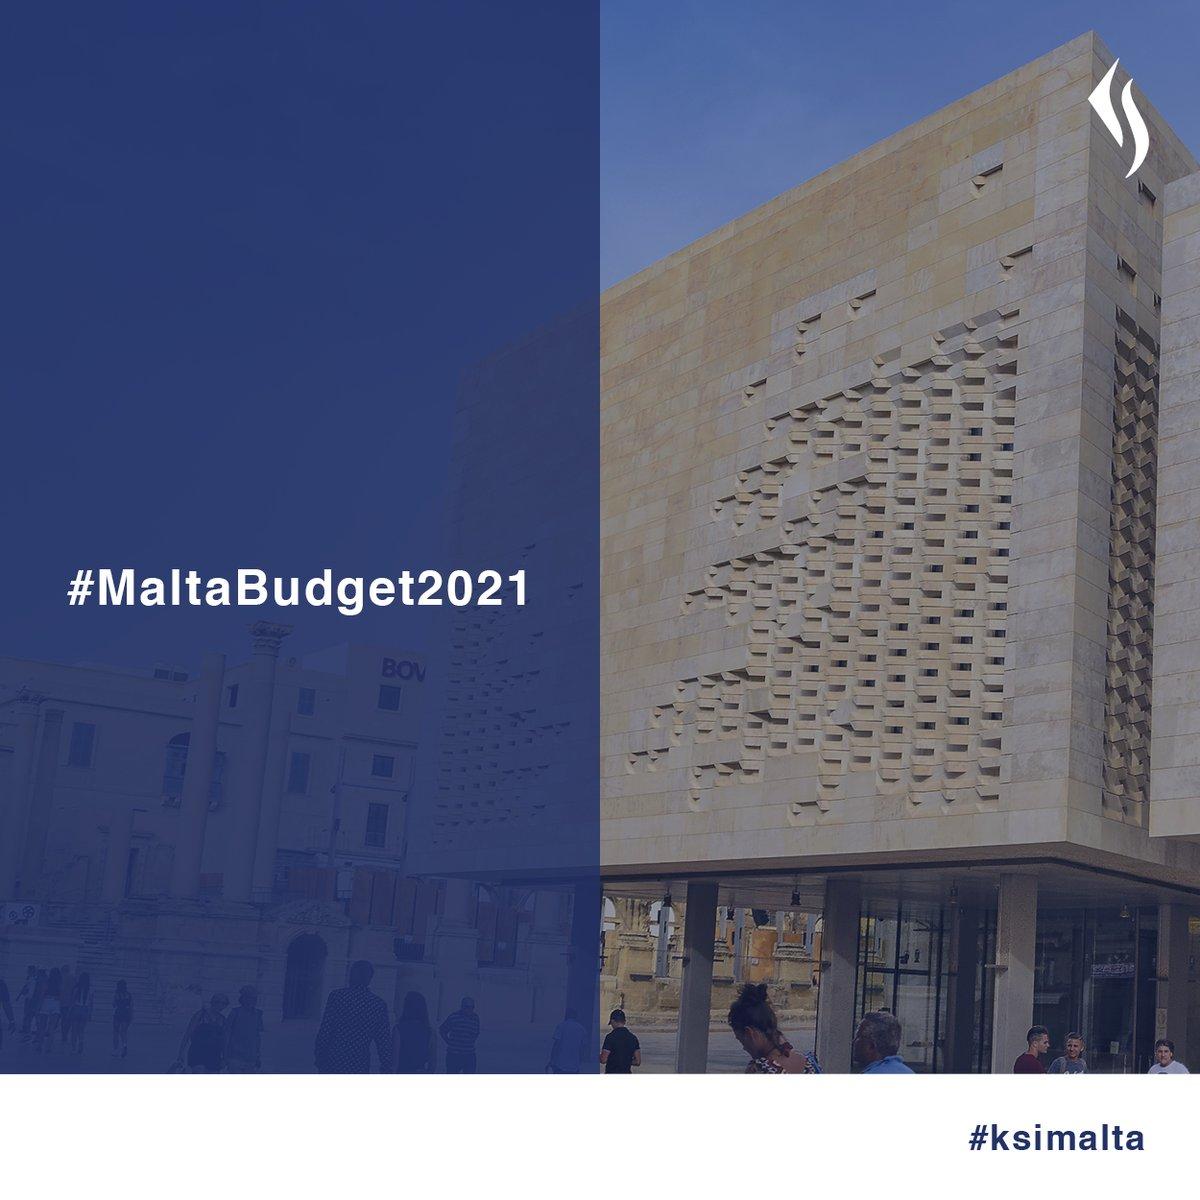 The Malta Budget 2021 starts in a few minutes. Stay tuned to our #livefeeds  #ksimalta #maltabudget21 @MaltaGov https://t.co/QJOBNmJ8ap